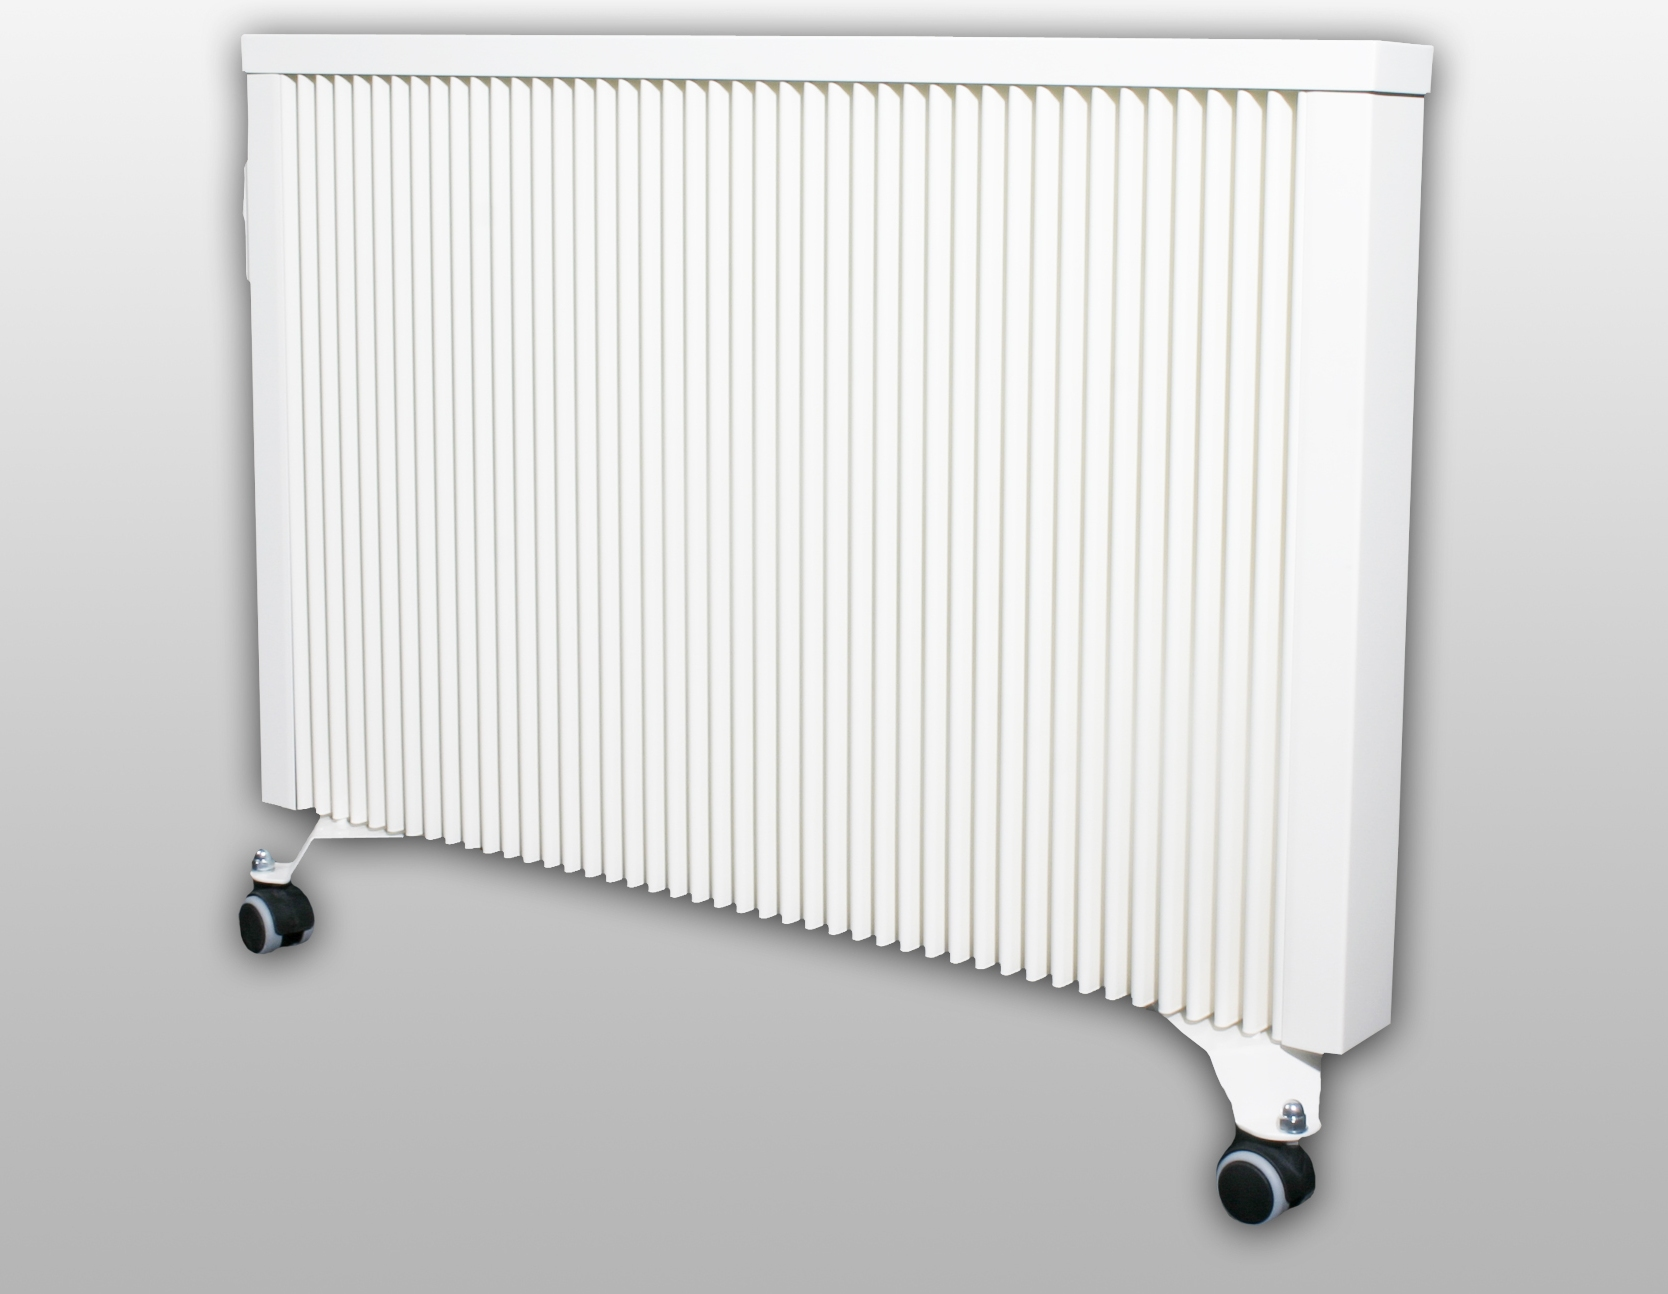 Topný panel série H, TYP H120, 1200 W